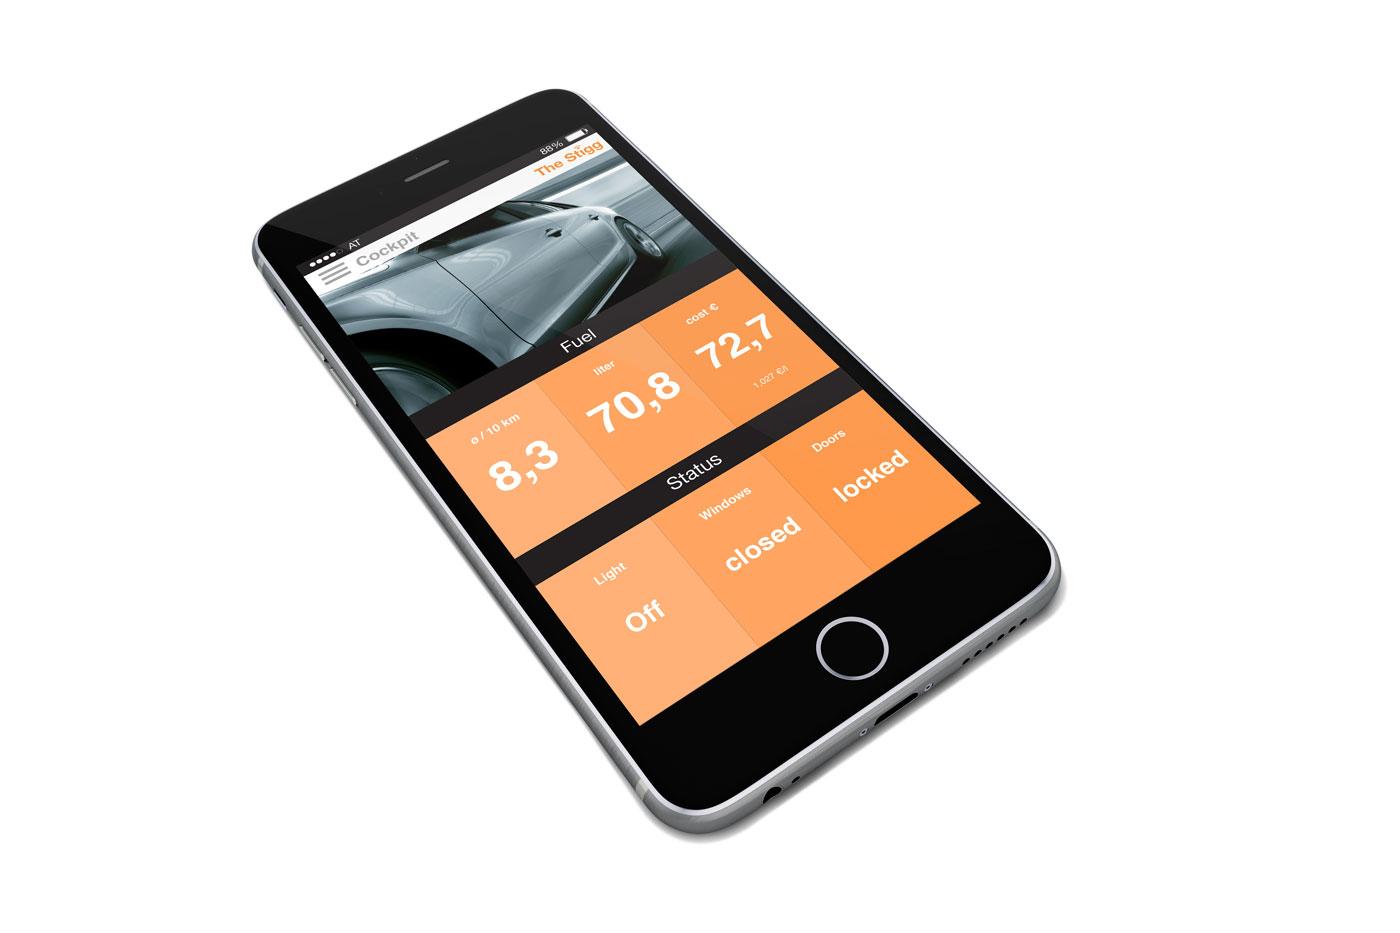 smarte-apps-7_the-stigg_designkitchen.jpg